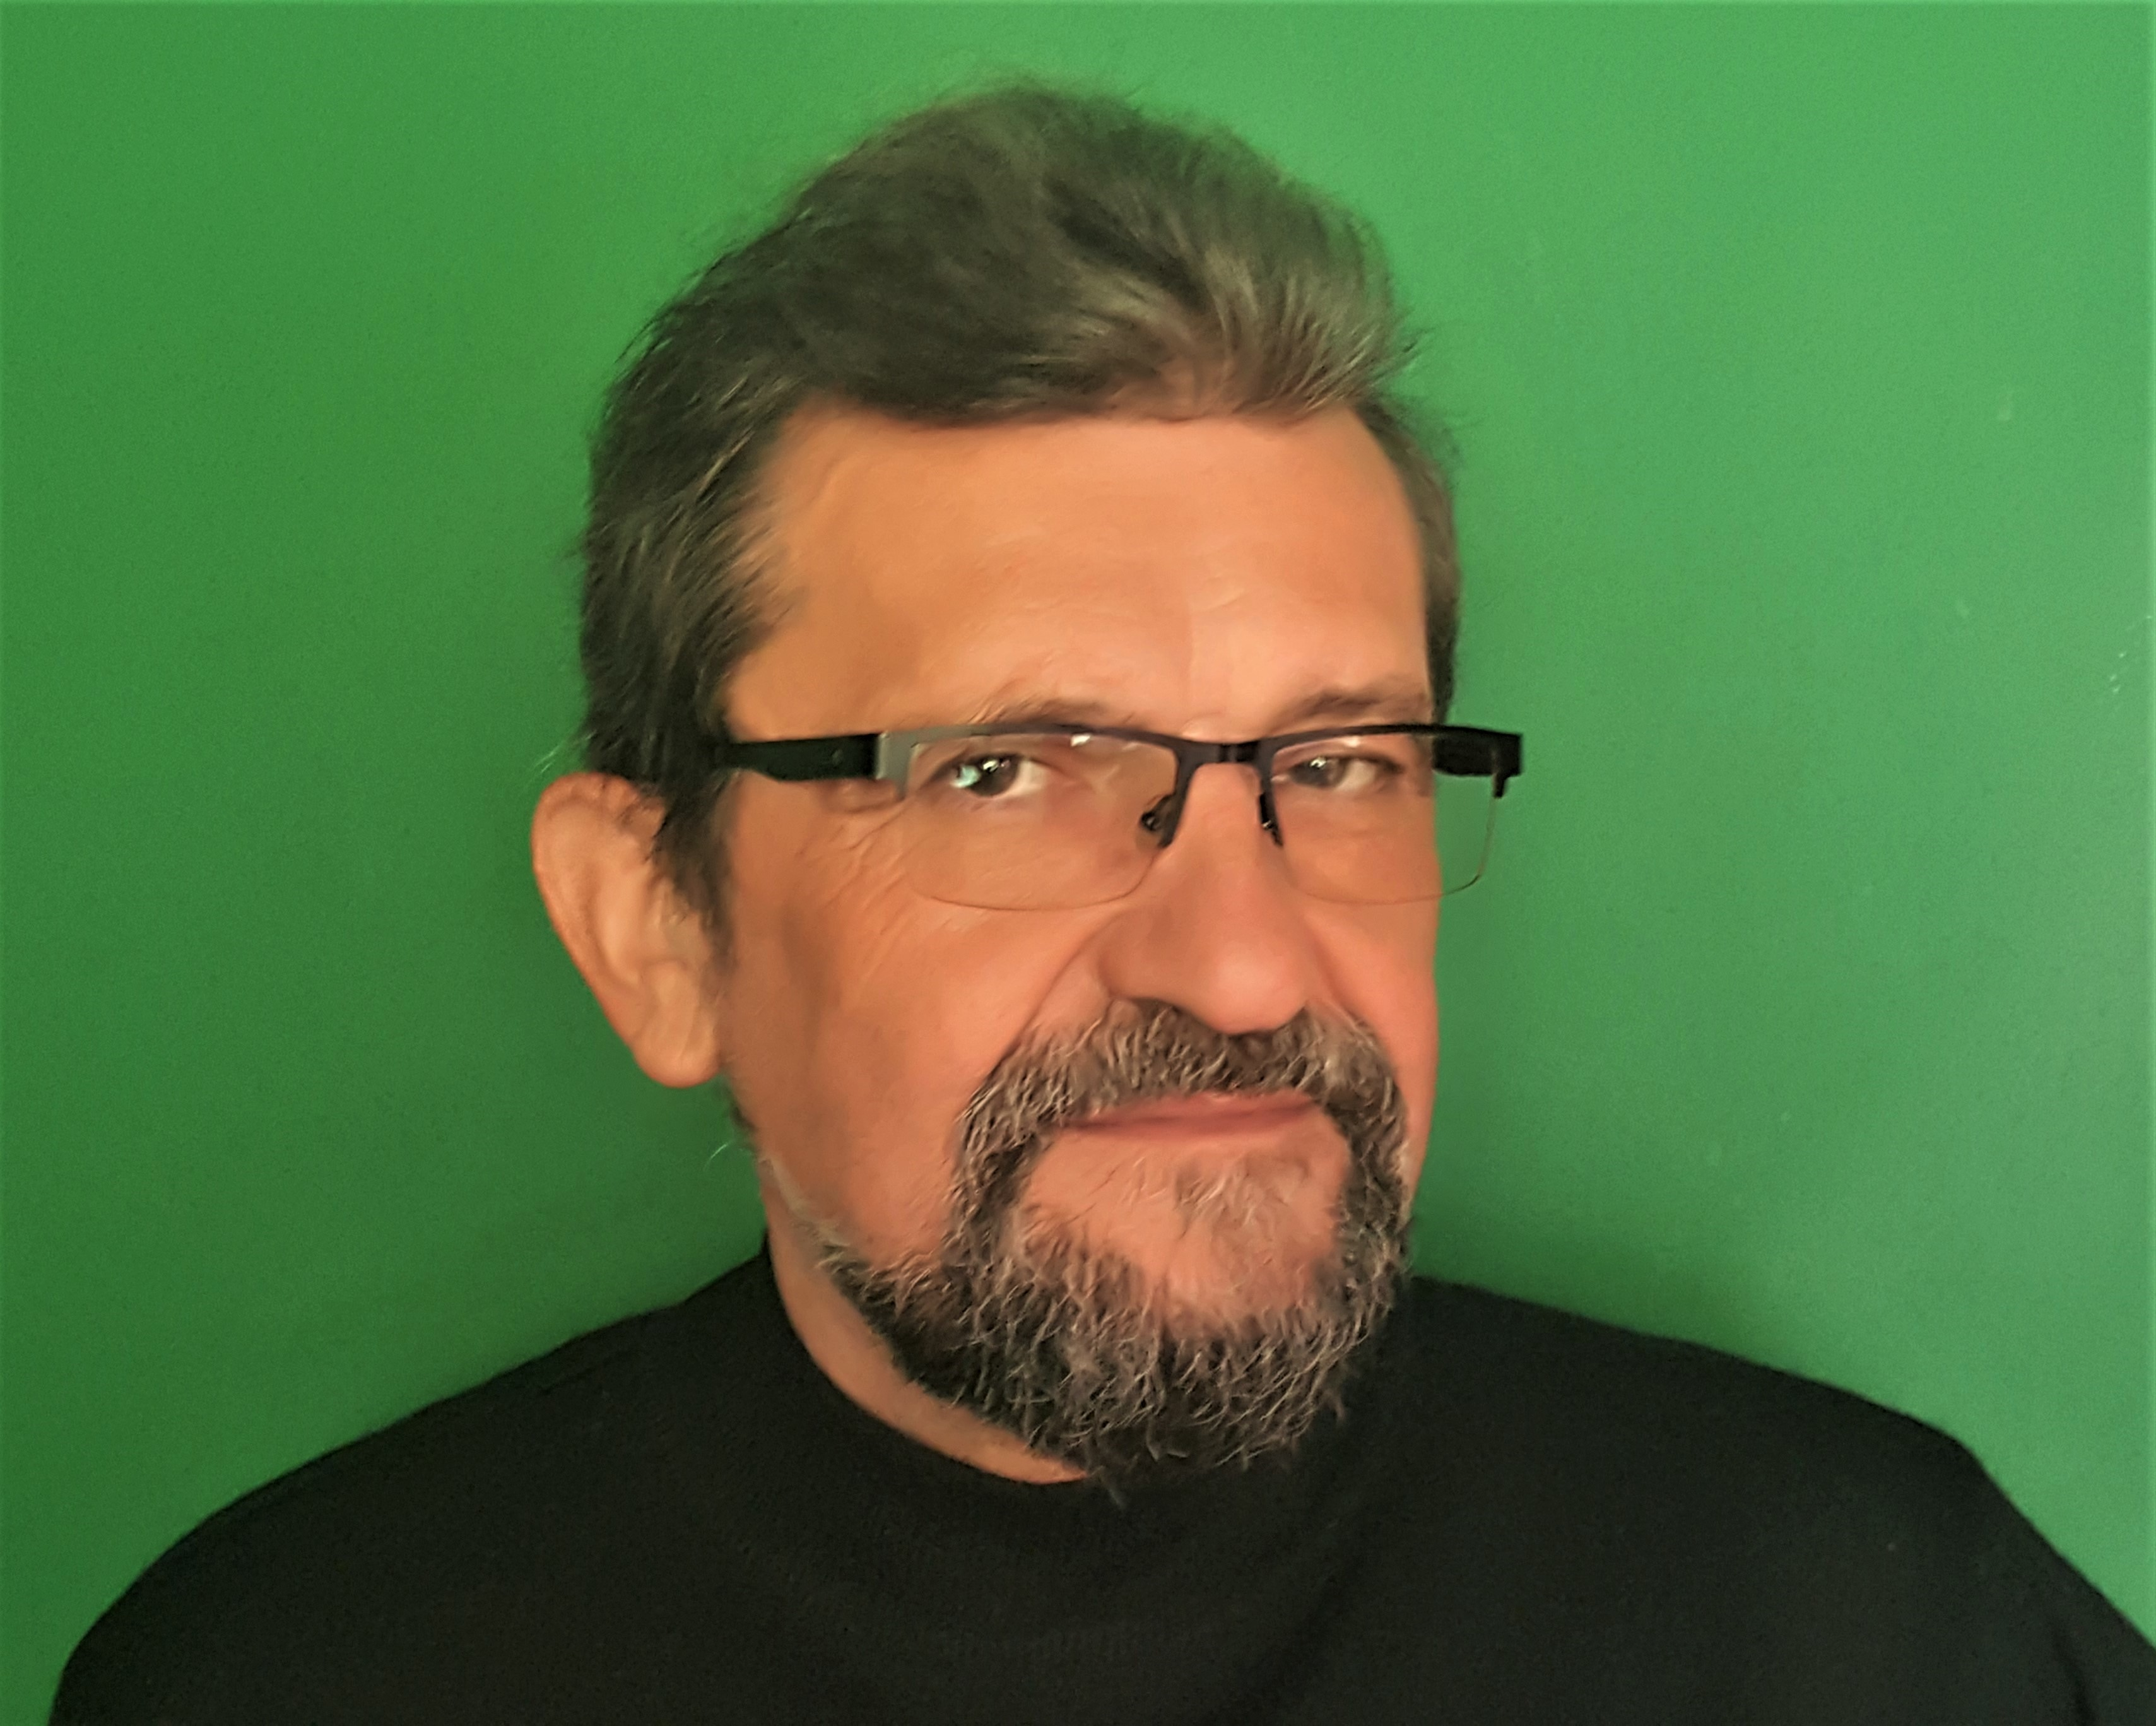 KP - FOTO - Michał Zabłocki.jpg